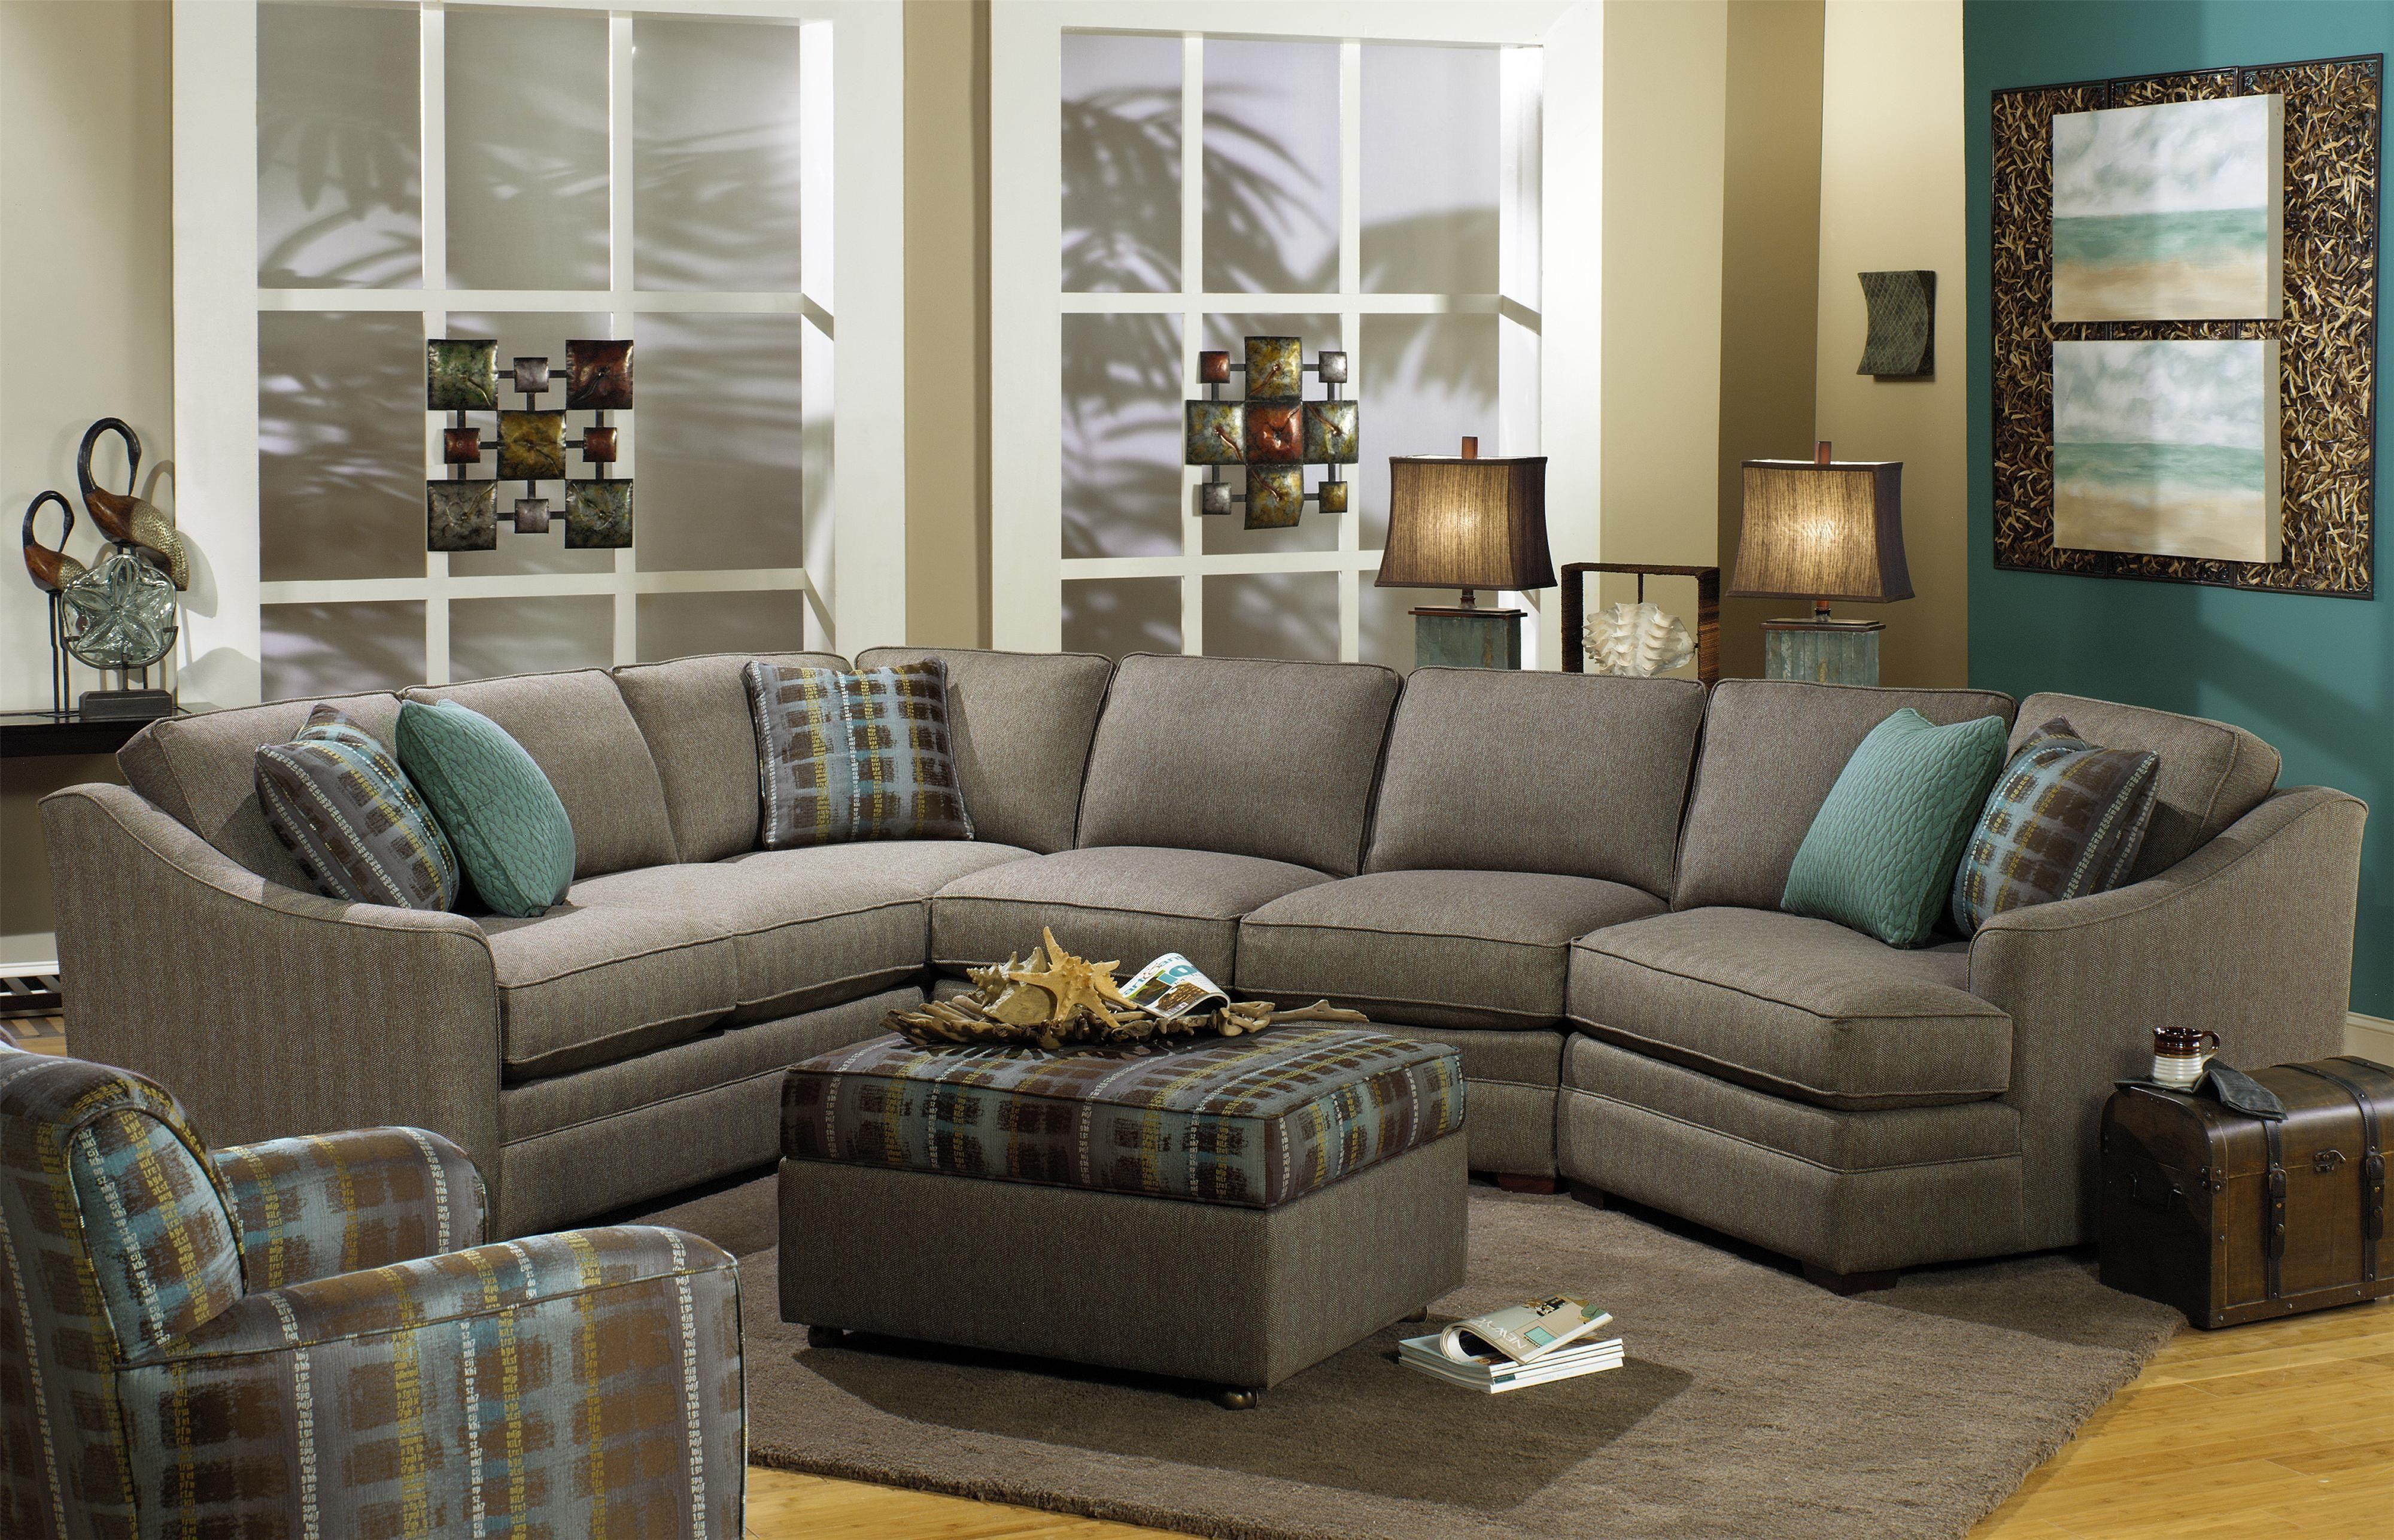 Custom Sectional Sofa Chicago Three Cushion With Chaise Cuddler Penaime